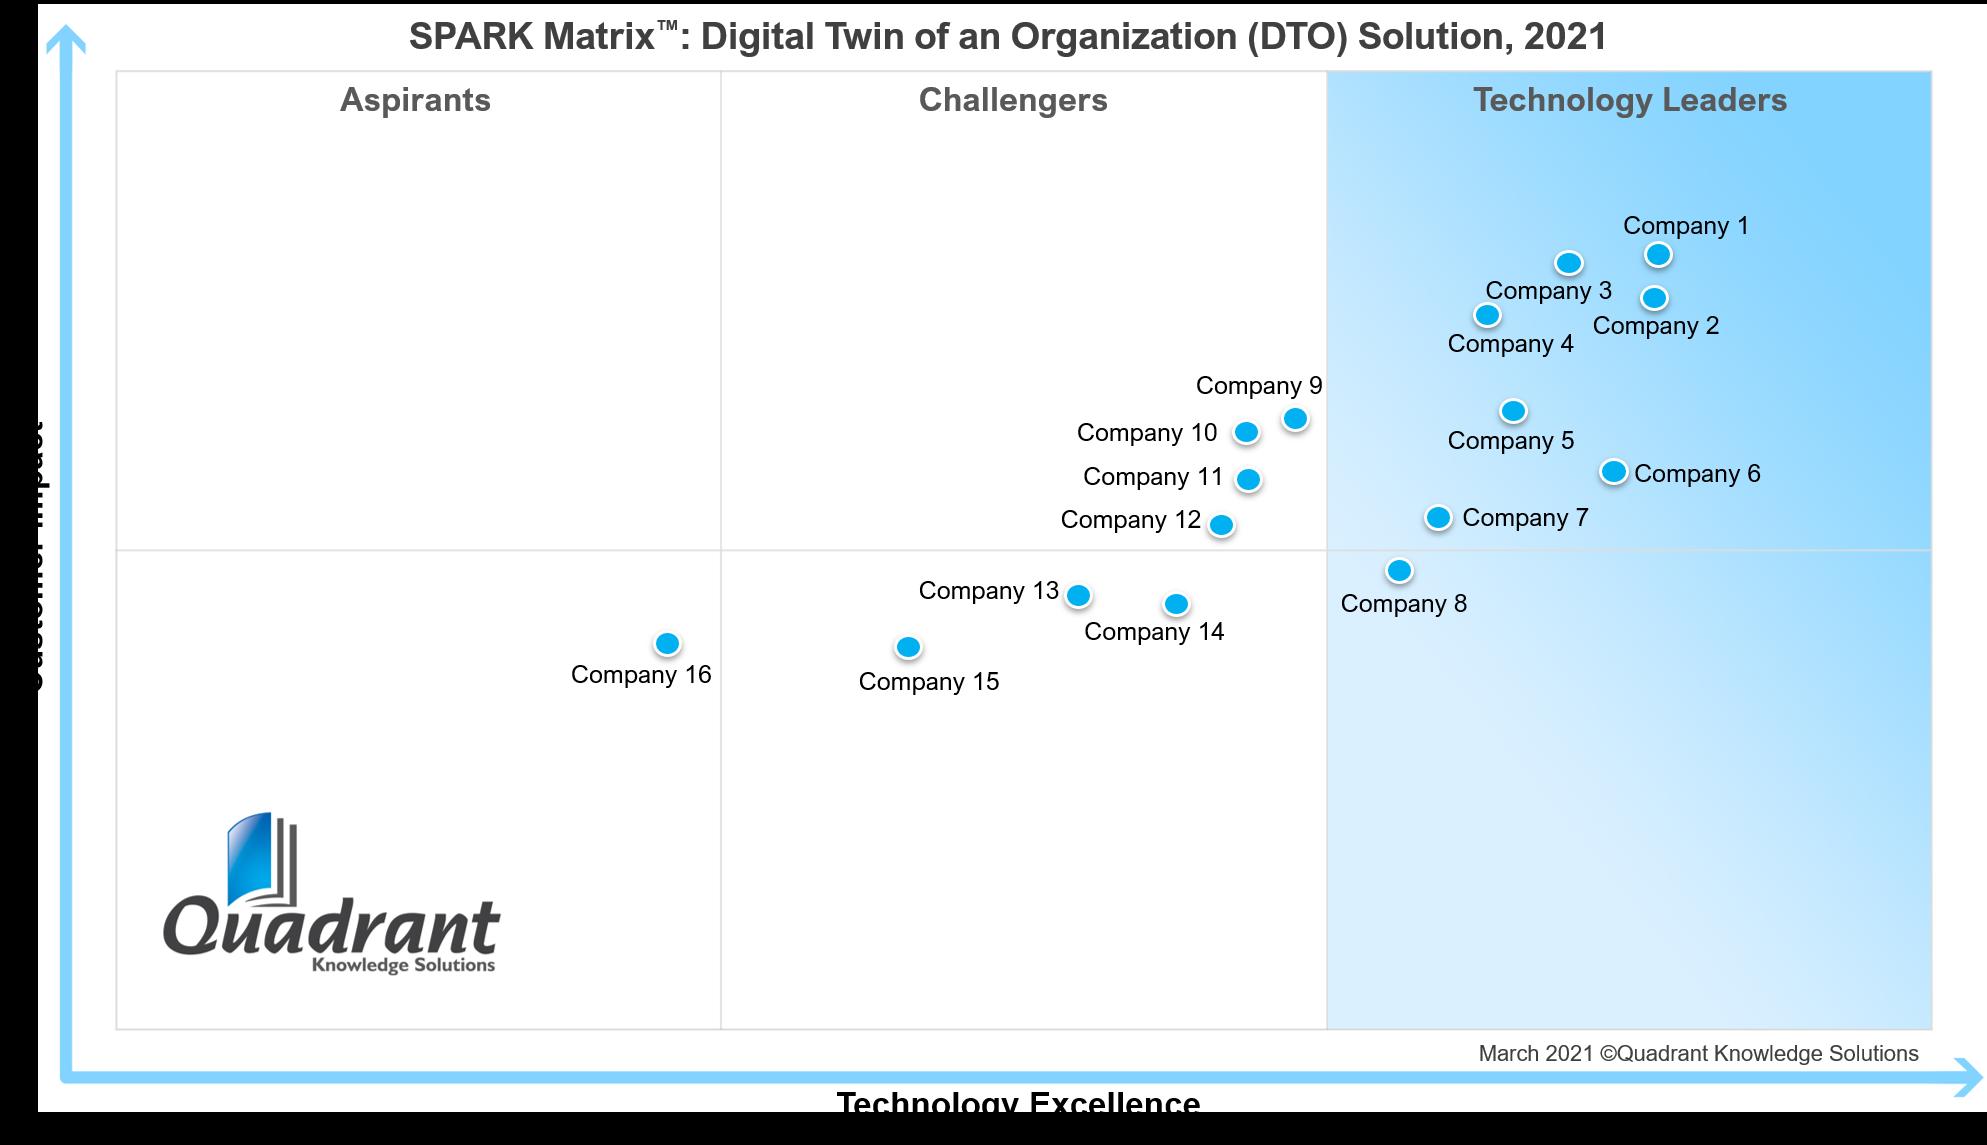 2021 SPARK Matrix_Digital Twin of Organization (DTO)